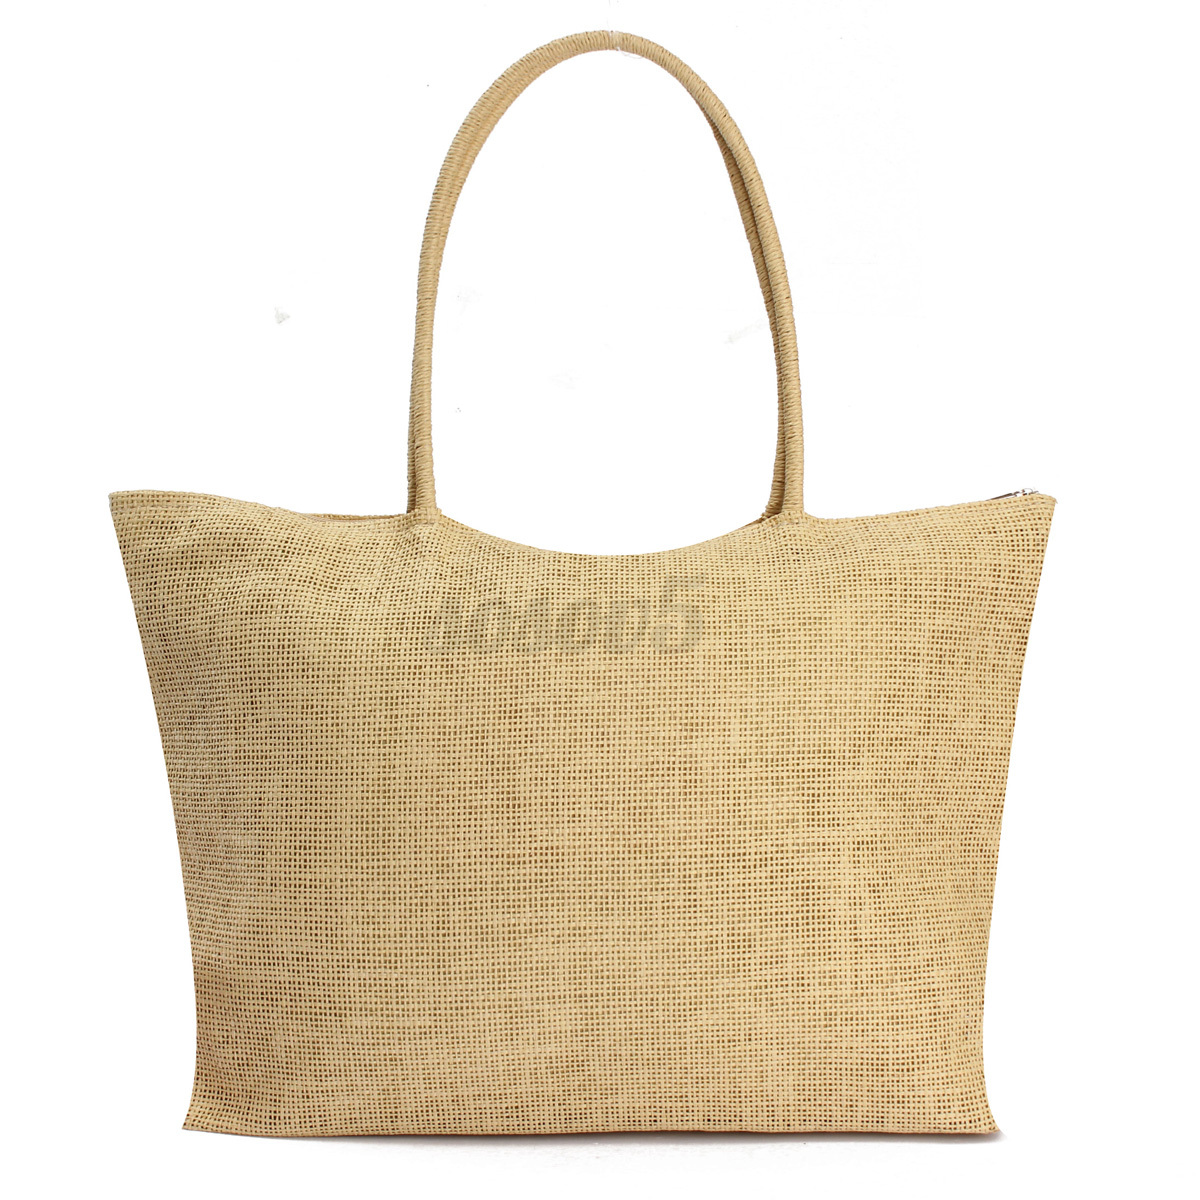 Women Summer Straw Weave Shoulder Tote Shopping Lady Beach Bag Purse Handbag HOT